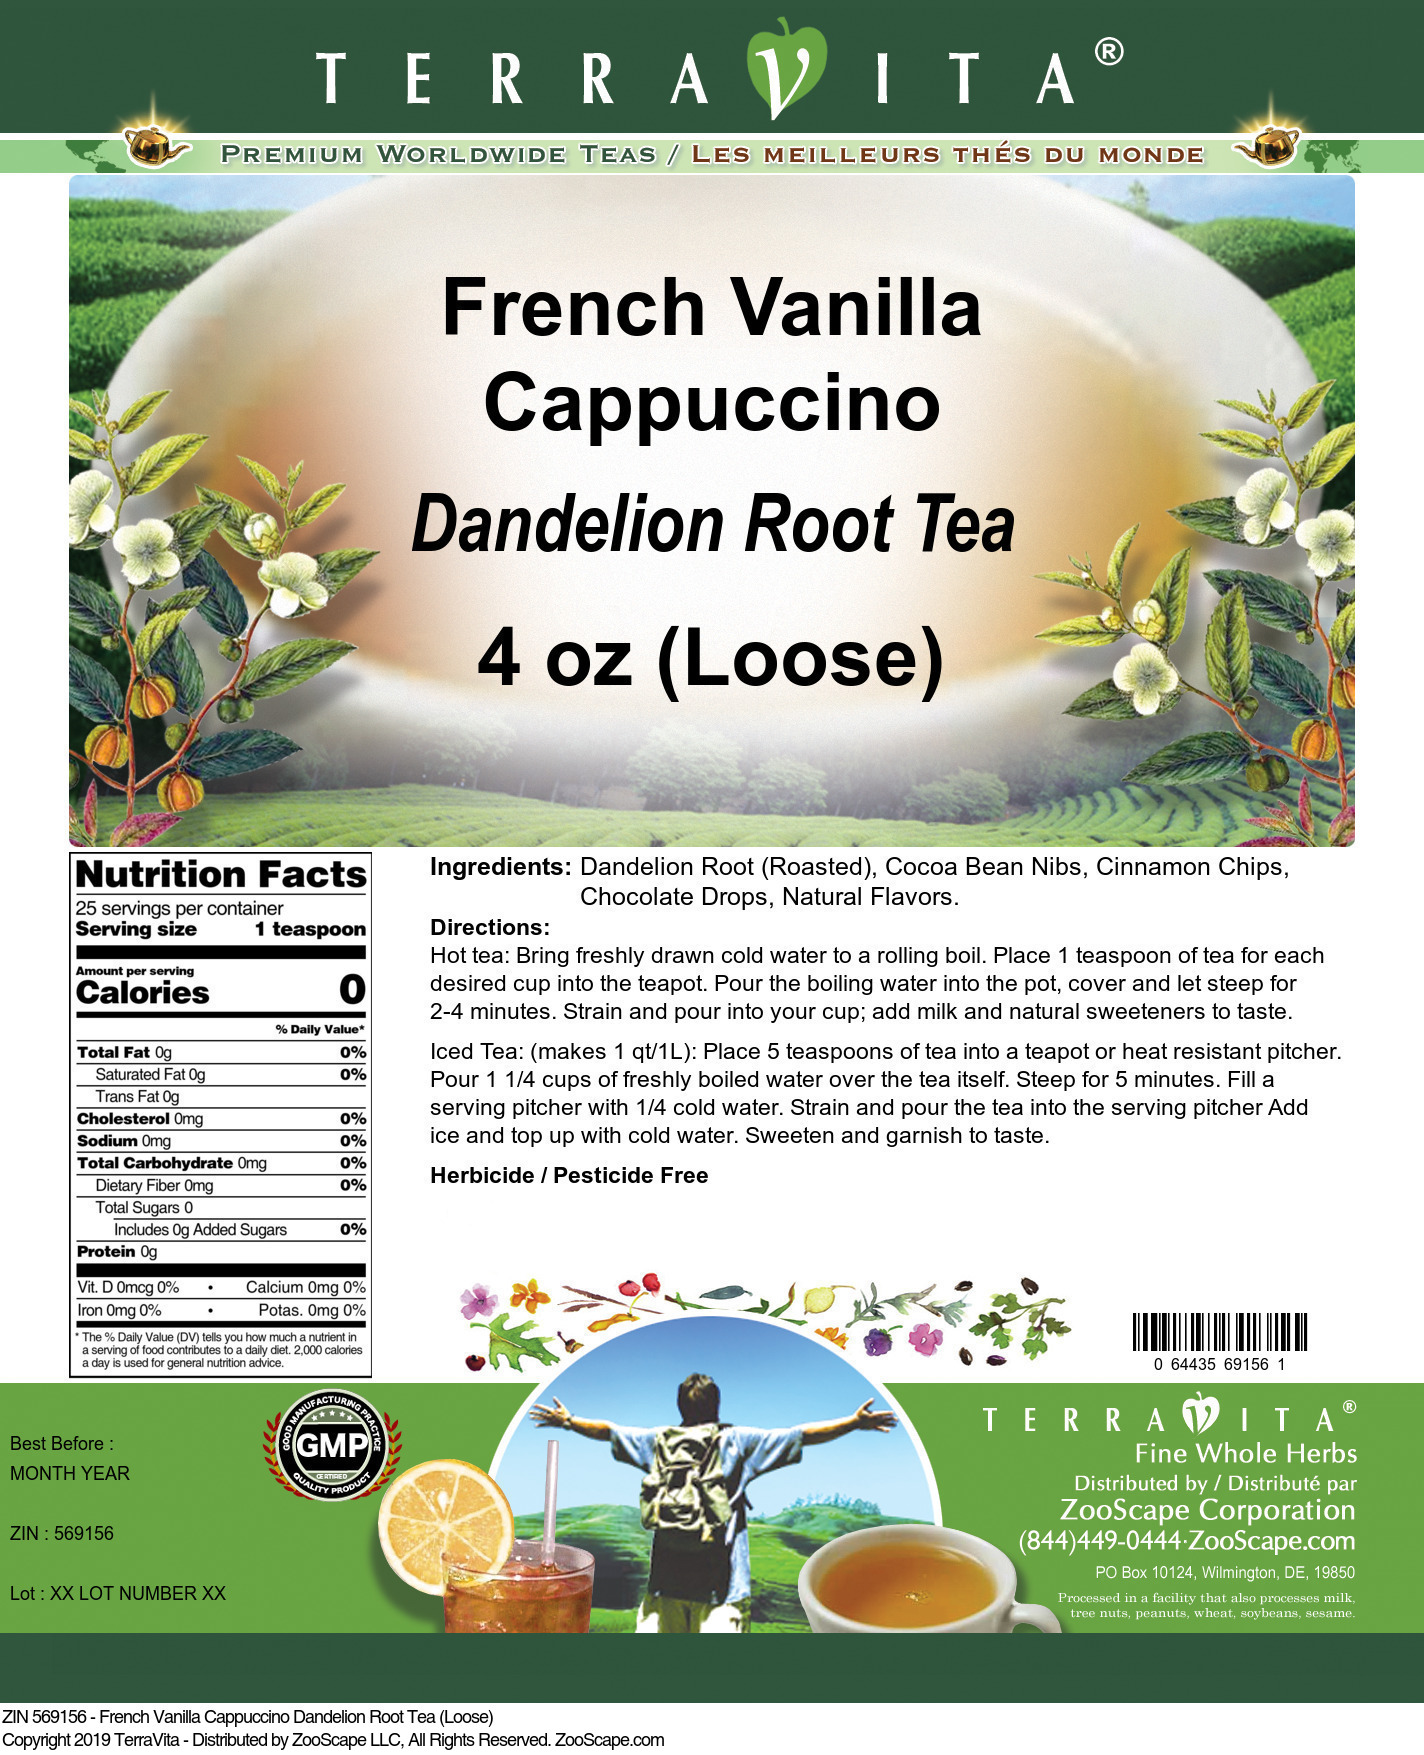 French Vanilla Cappuccino Dandelion Root Tea (Loose)